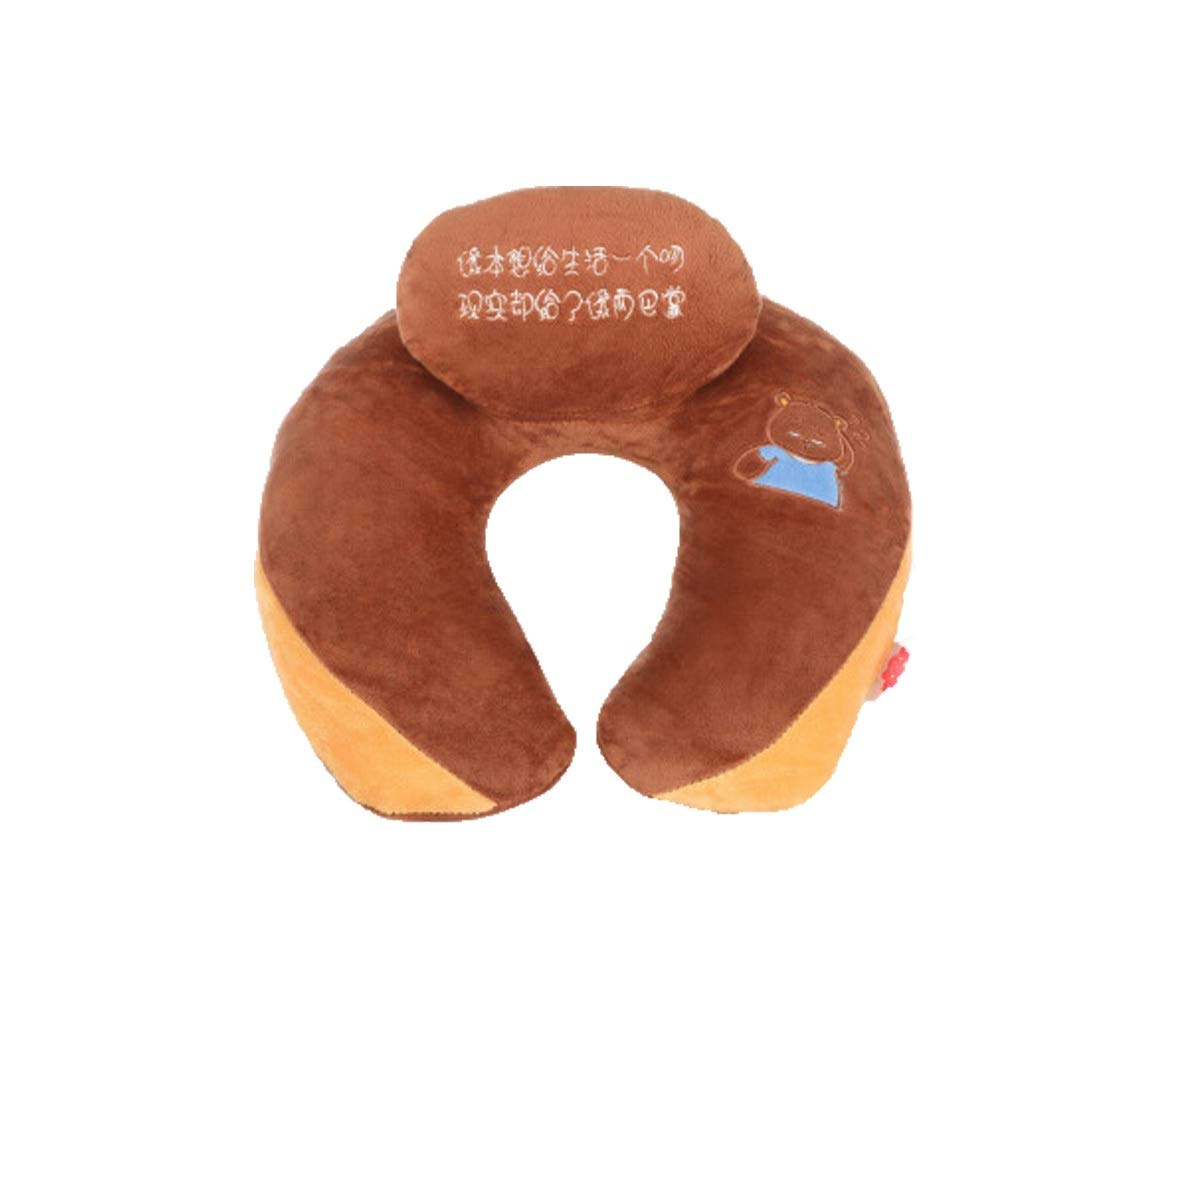 Huijun Style, U-shaped Pillow, The Latest U-shaped Pillow, Neck-protecting Aircraft, Train Pillow, Nap Neck Pillow, Travel Neck Pillow U-shaped, U-shaped Pillow (Color : Brown)